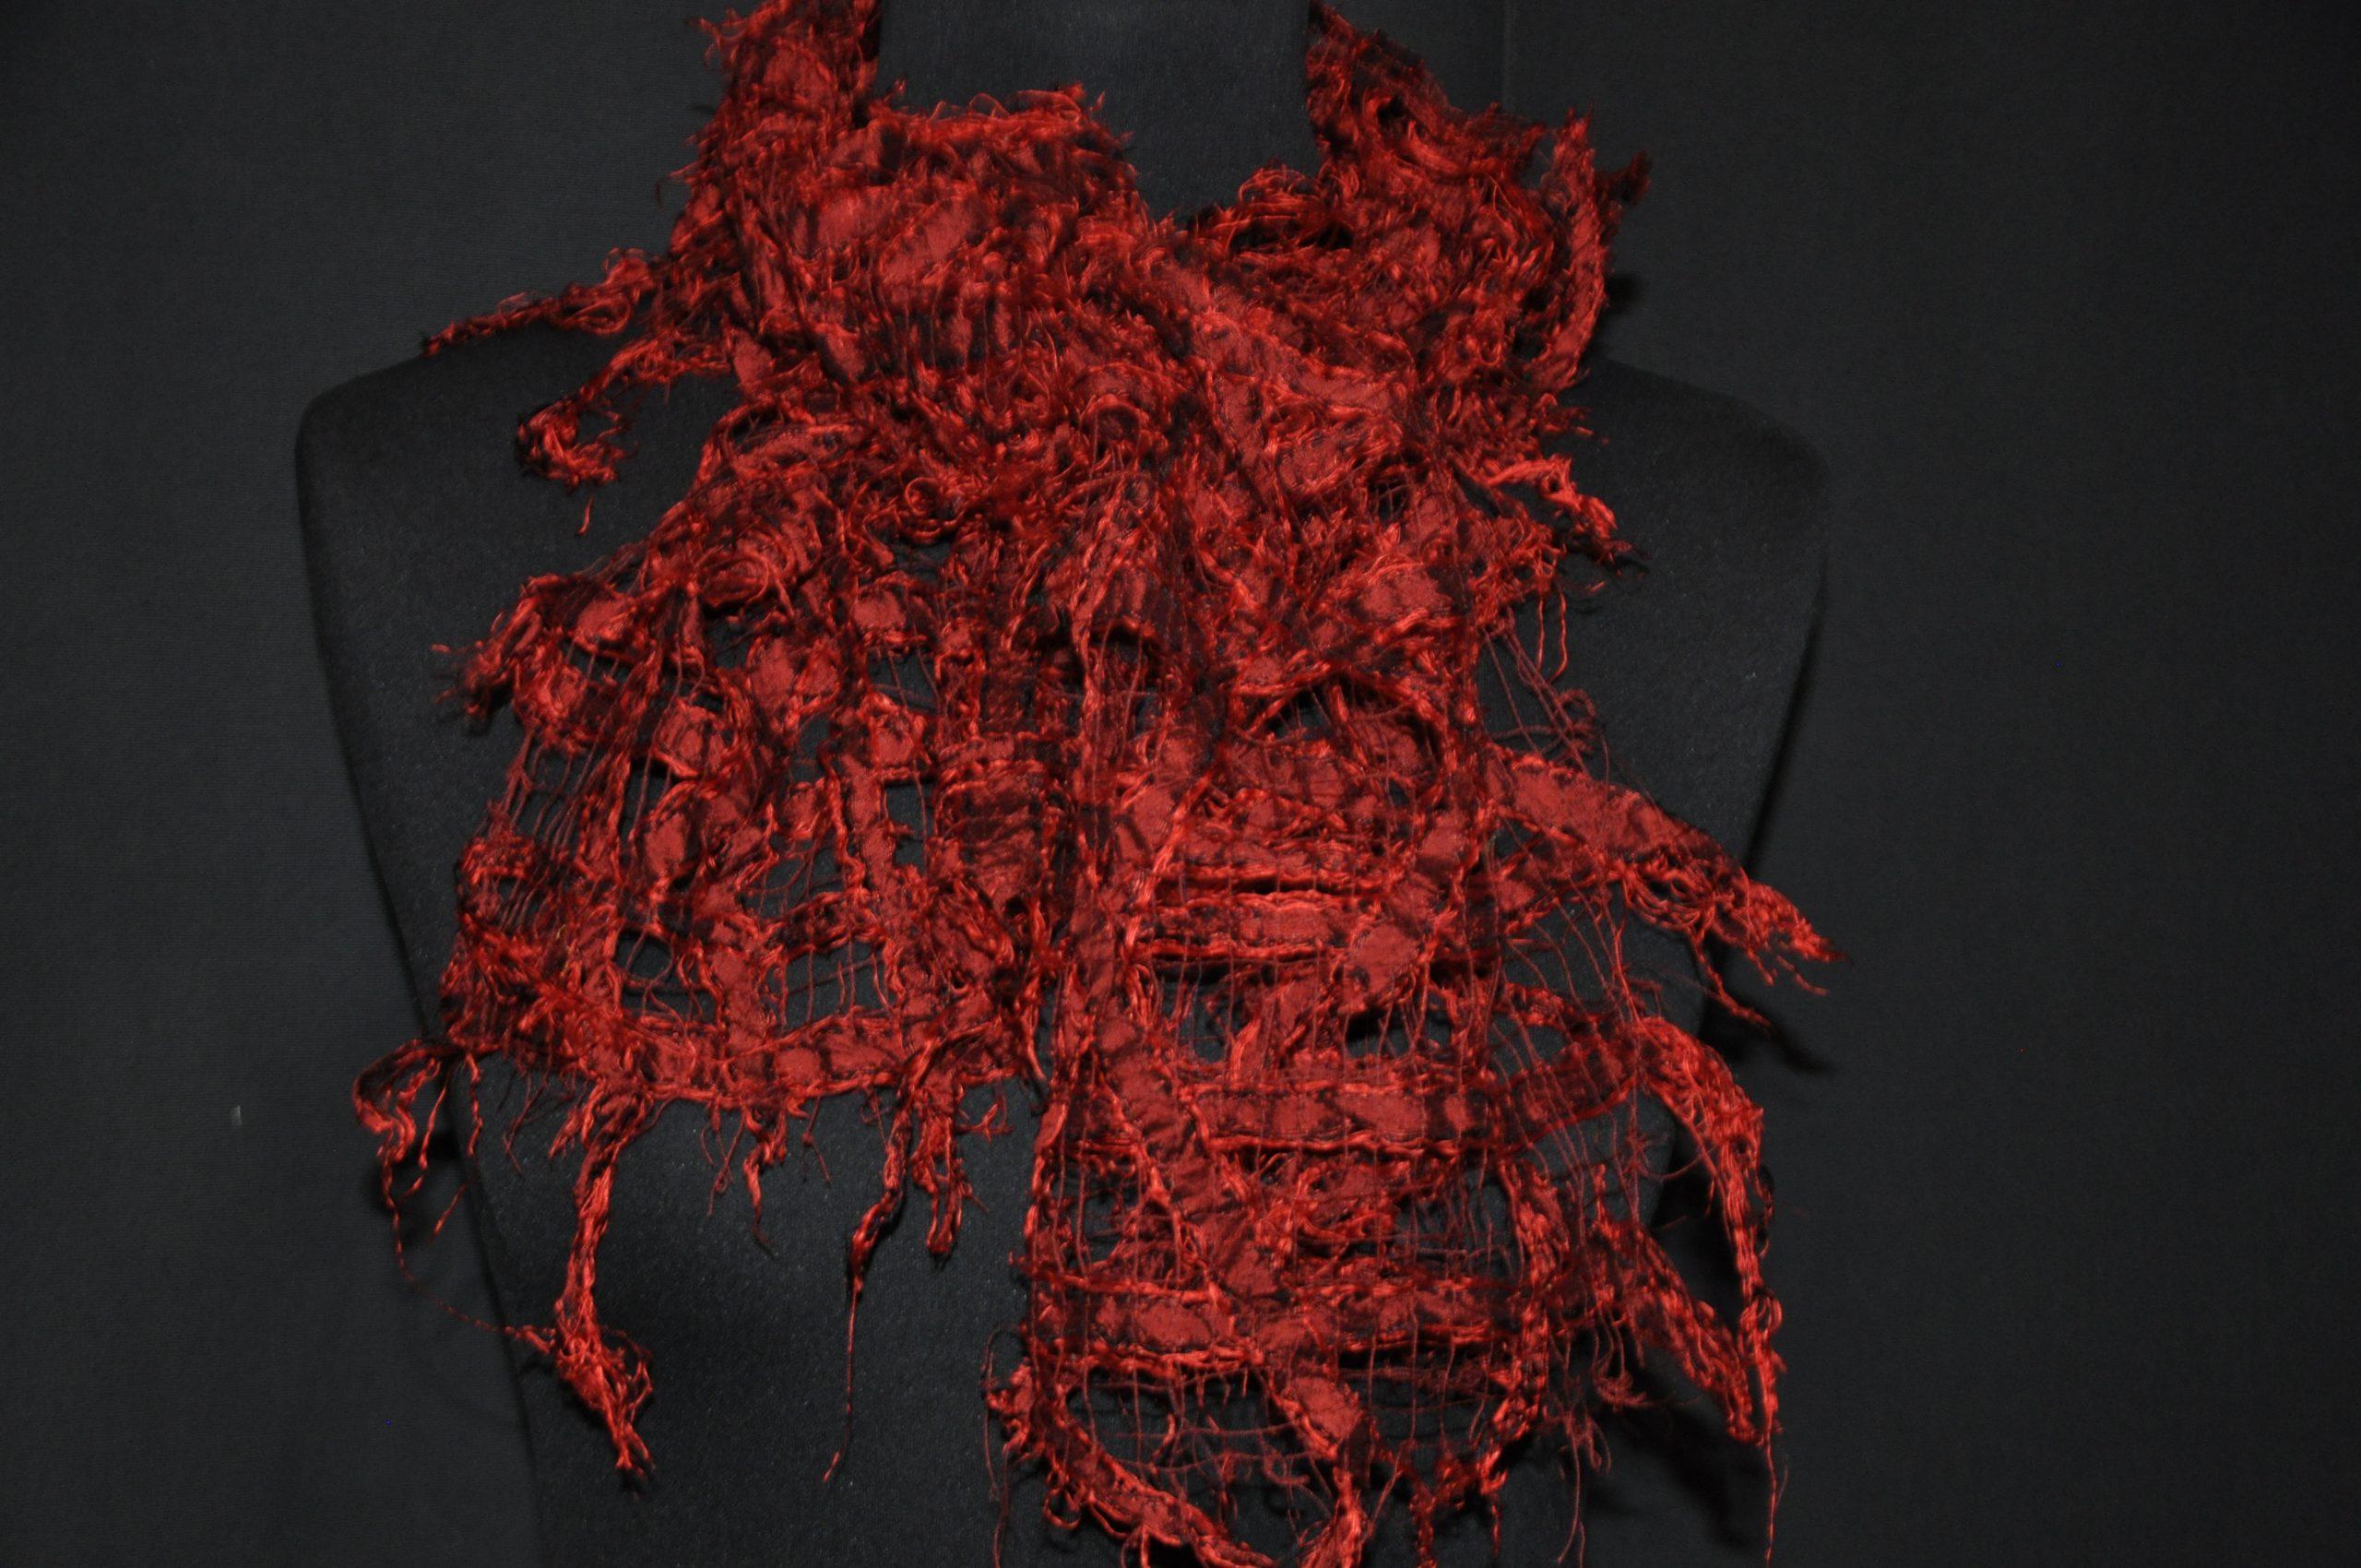 Seidenschal - rot, durchbrochen